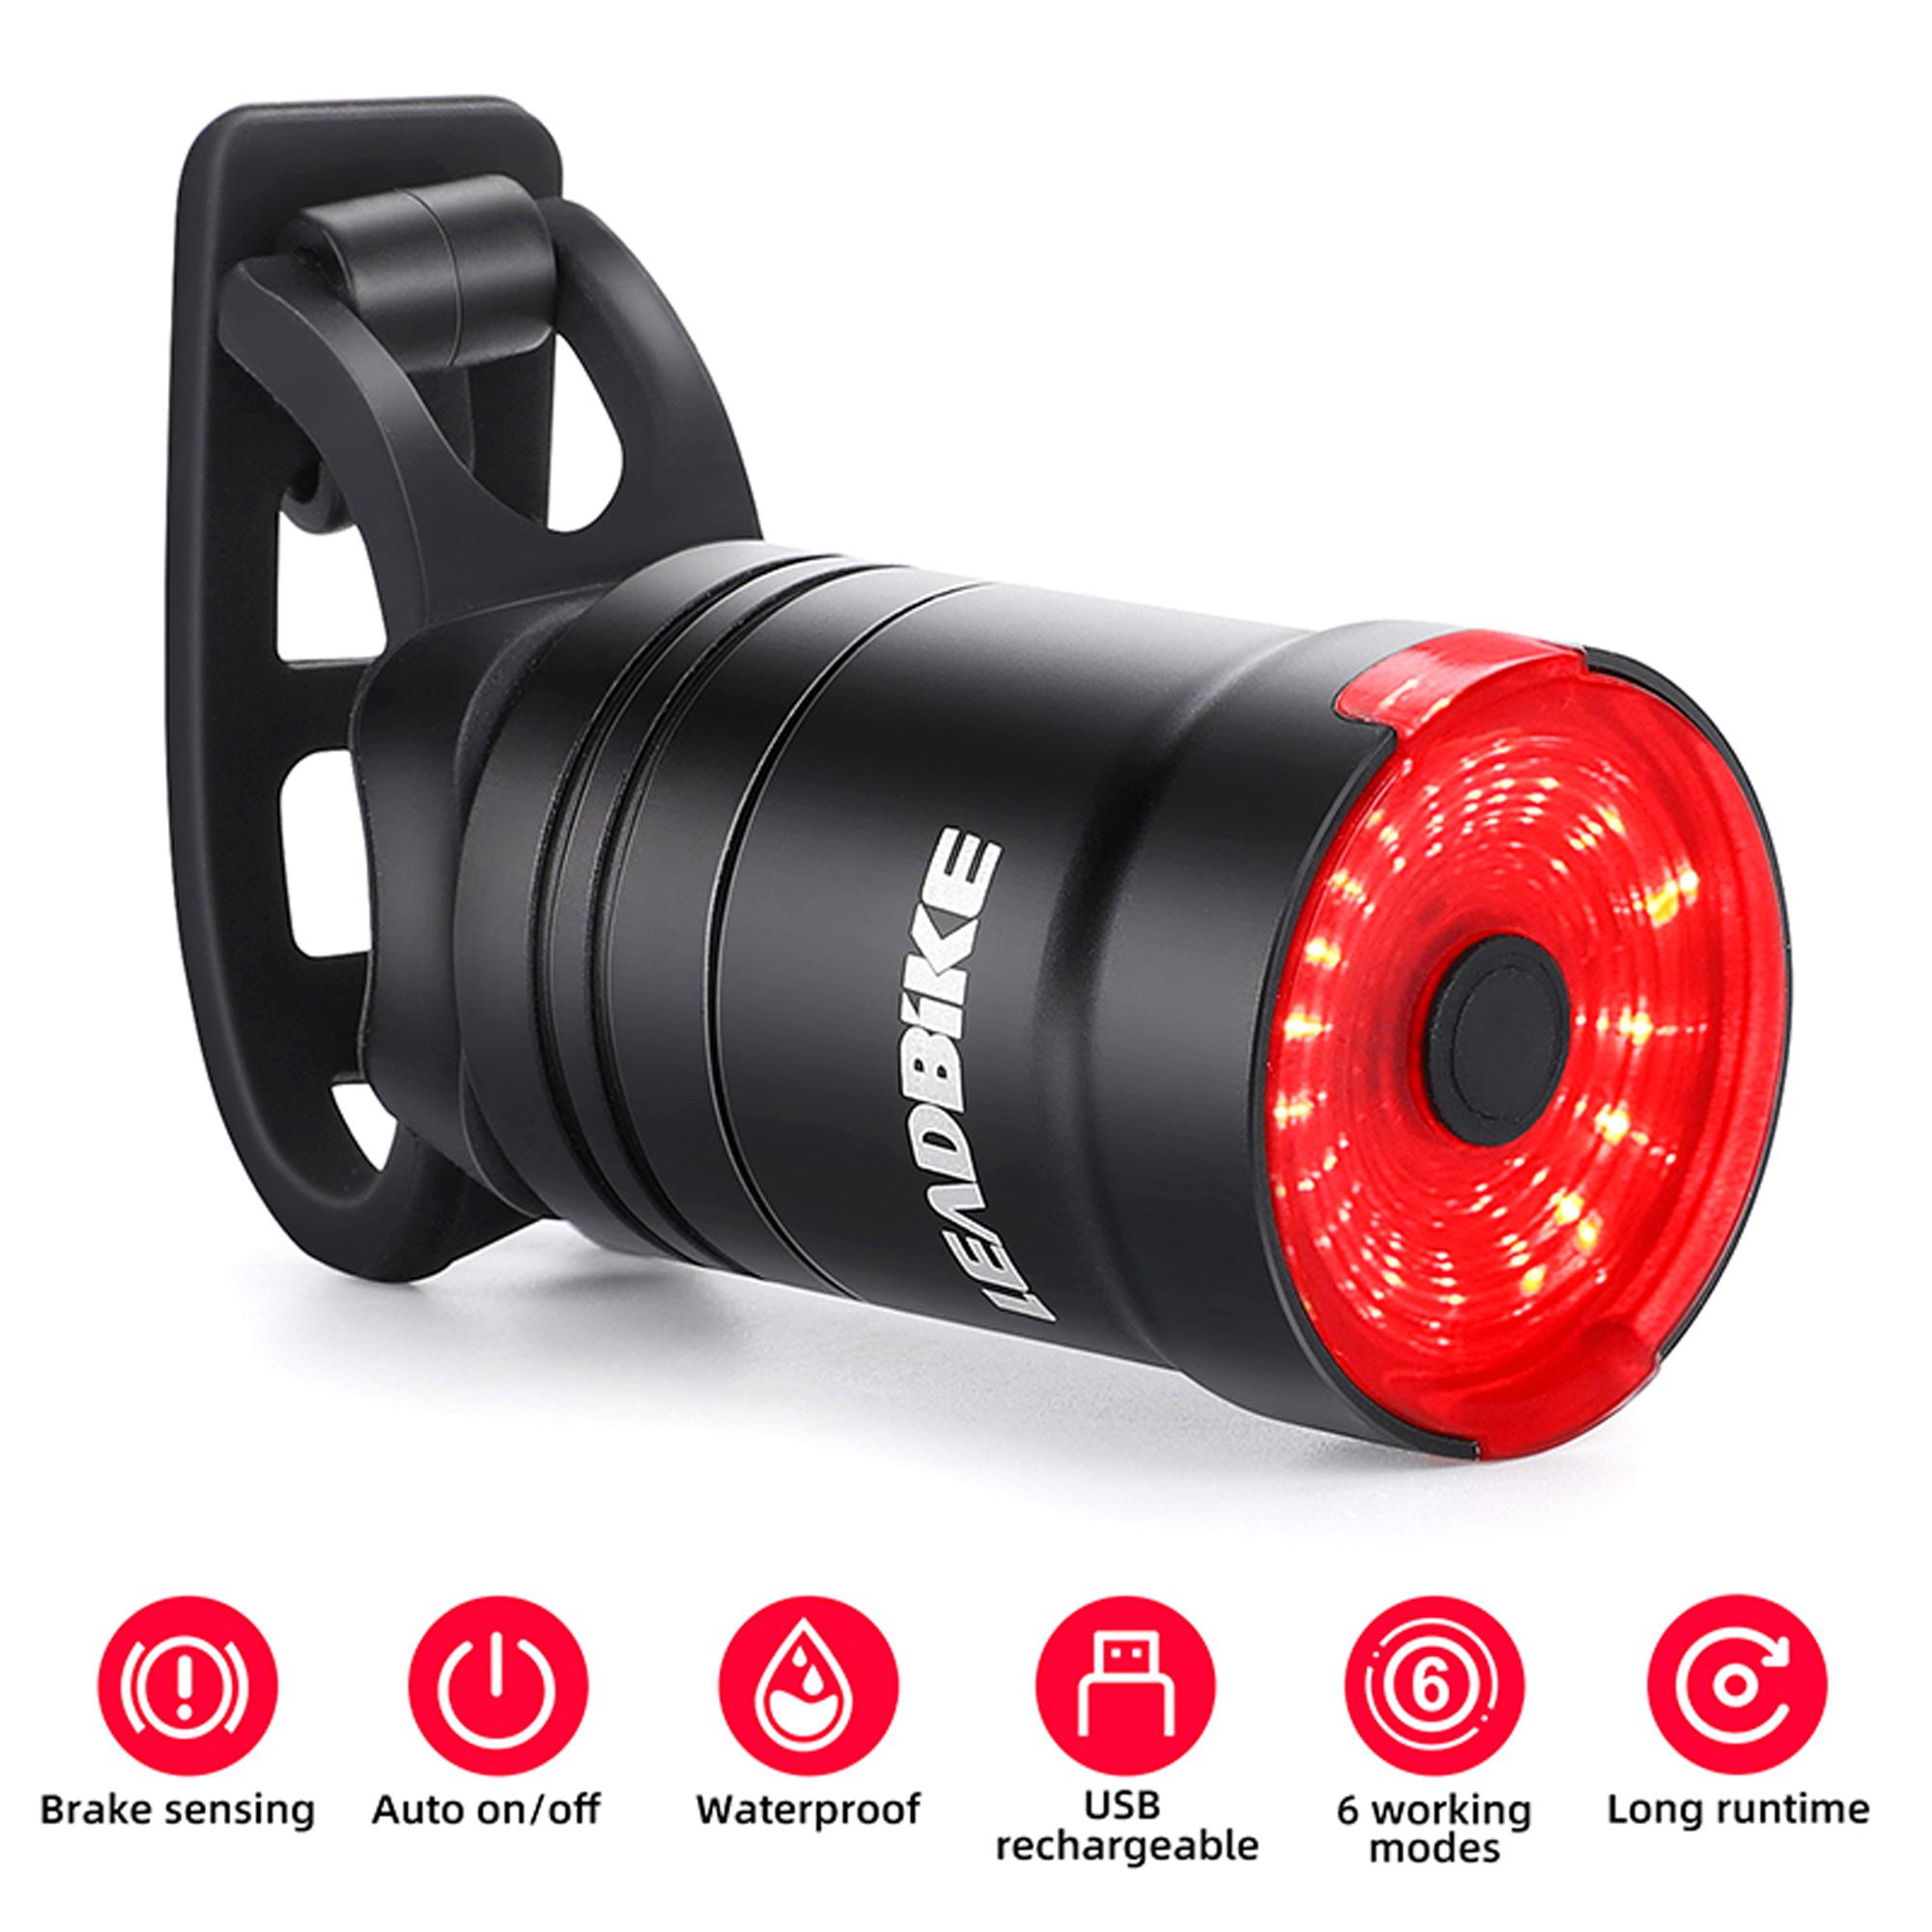 IPx6 Waterproof LED Charging Smart Bicycle Auto Brake Sensing Cycling Tail Light